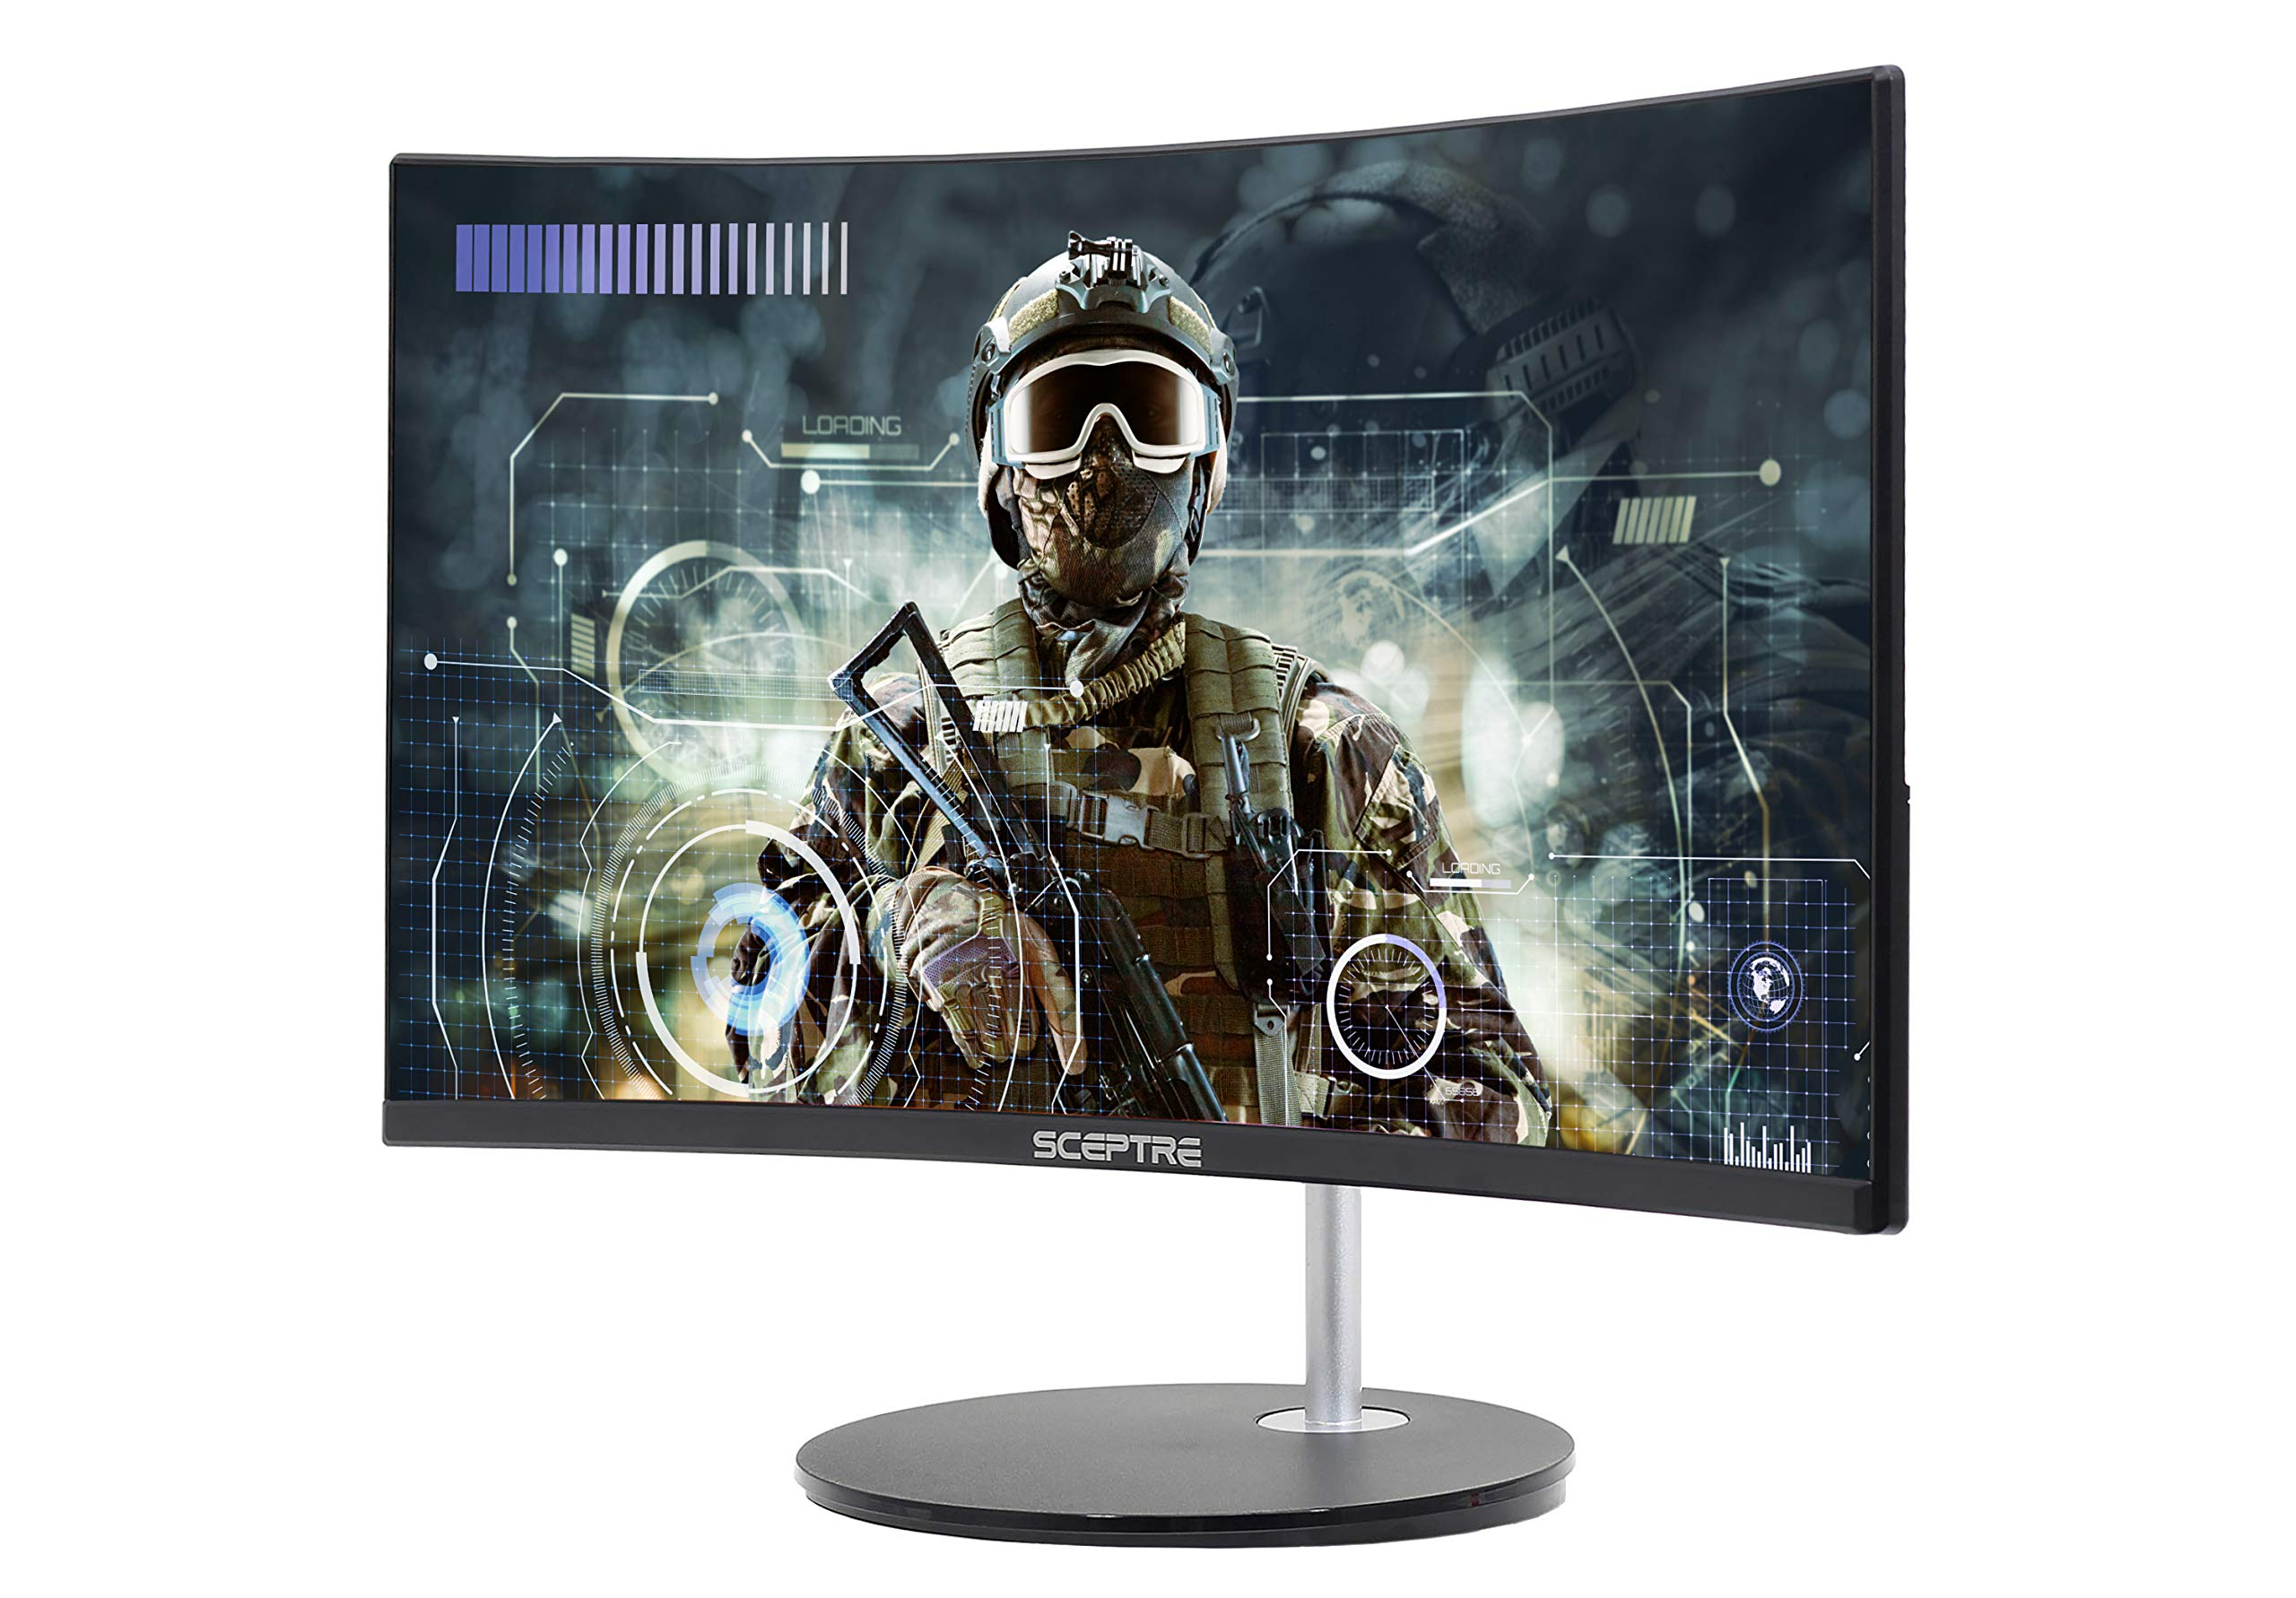 "Sceptre 24"" Curved 75Hz Gaming LED Monitor Full HD 1080P HDMI VGA Speakers, VESA Wall Mount Ready Metal Black 2019 (C248W-1920RN) 3"